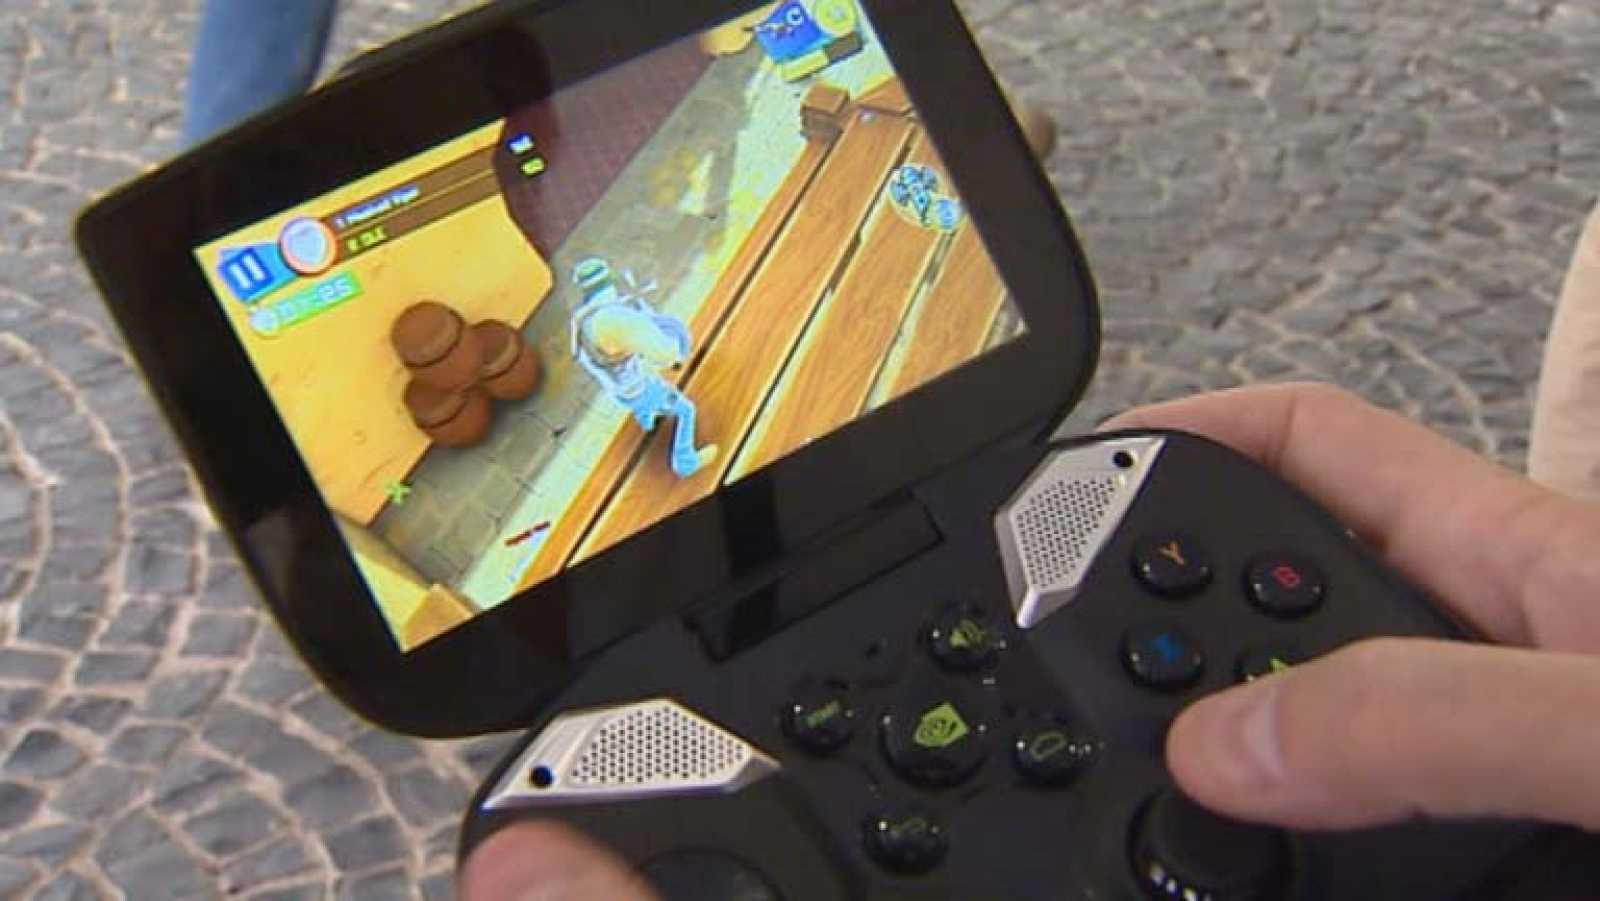 Se celebra GAMELAB, feria del videojuego, en Barcelona